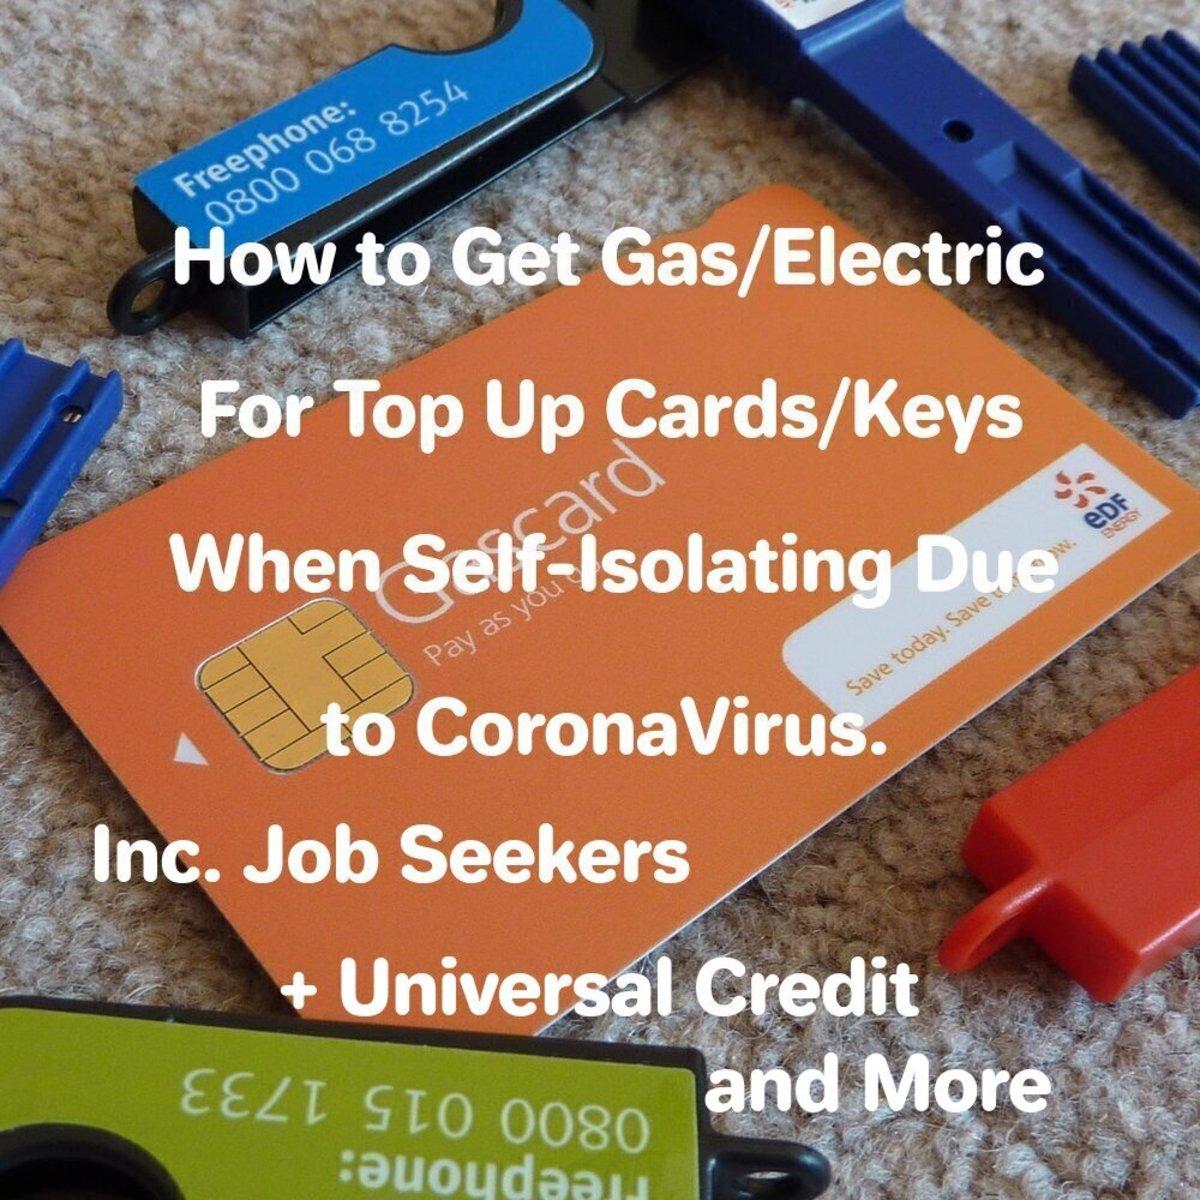 Self isolation #coronavirus #jobseekers info #Universal-credit info online shopping info